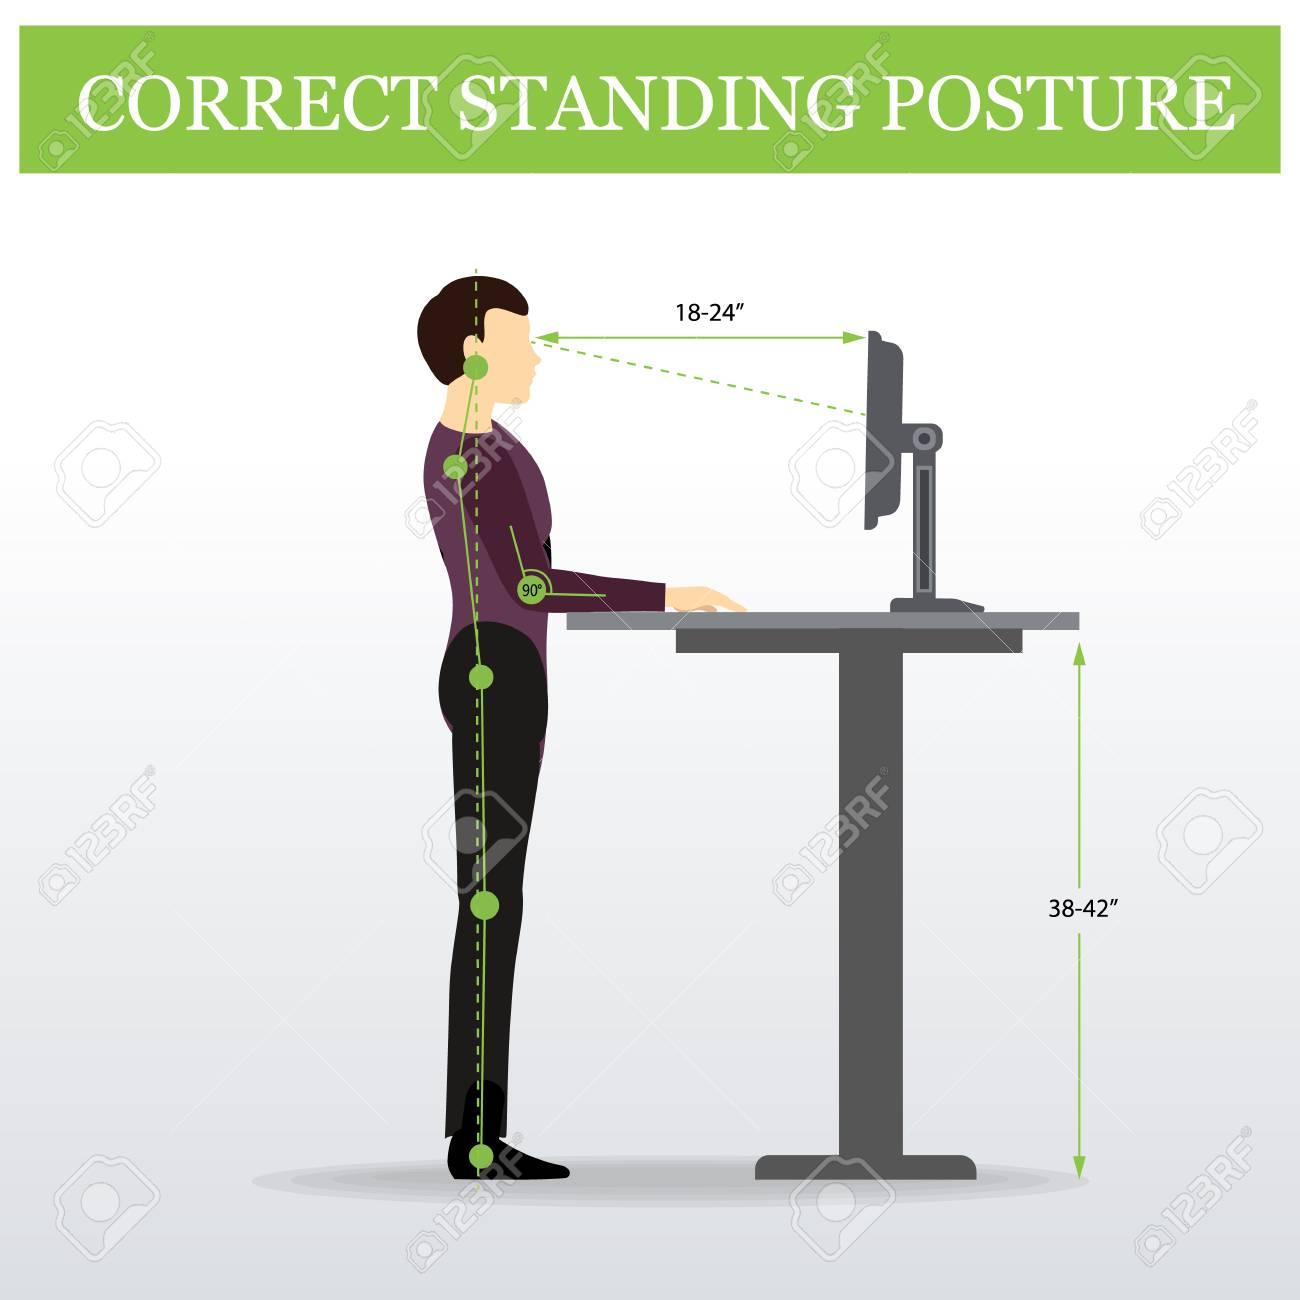 Ergonomic Correct Standing Posture On Height Adjustable Desk